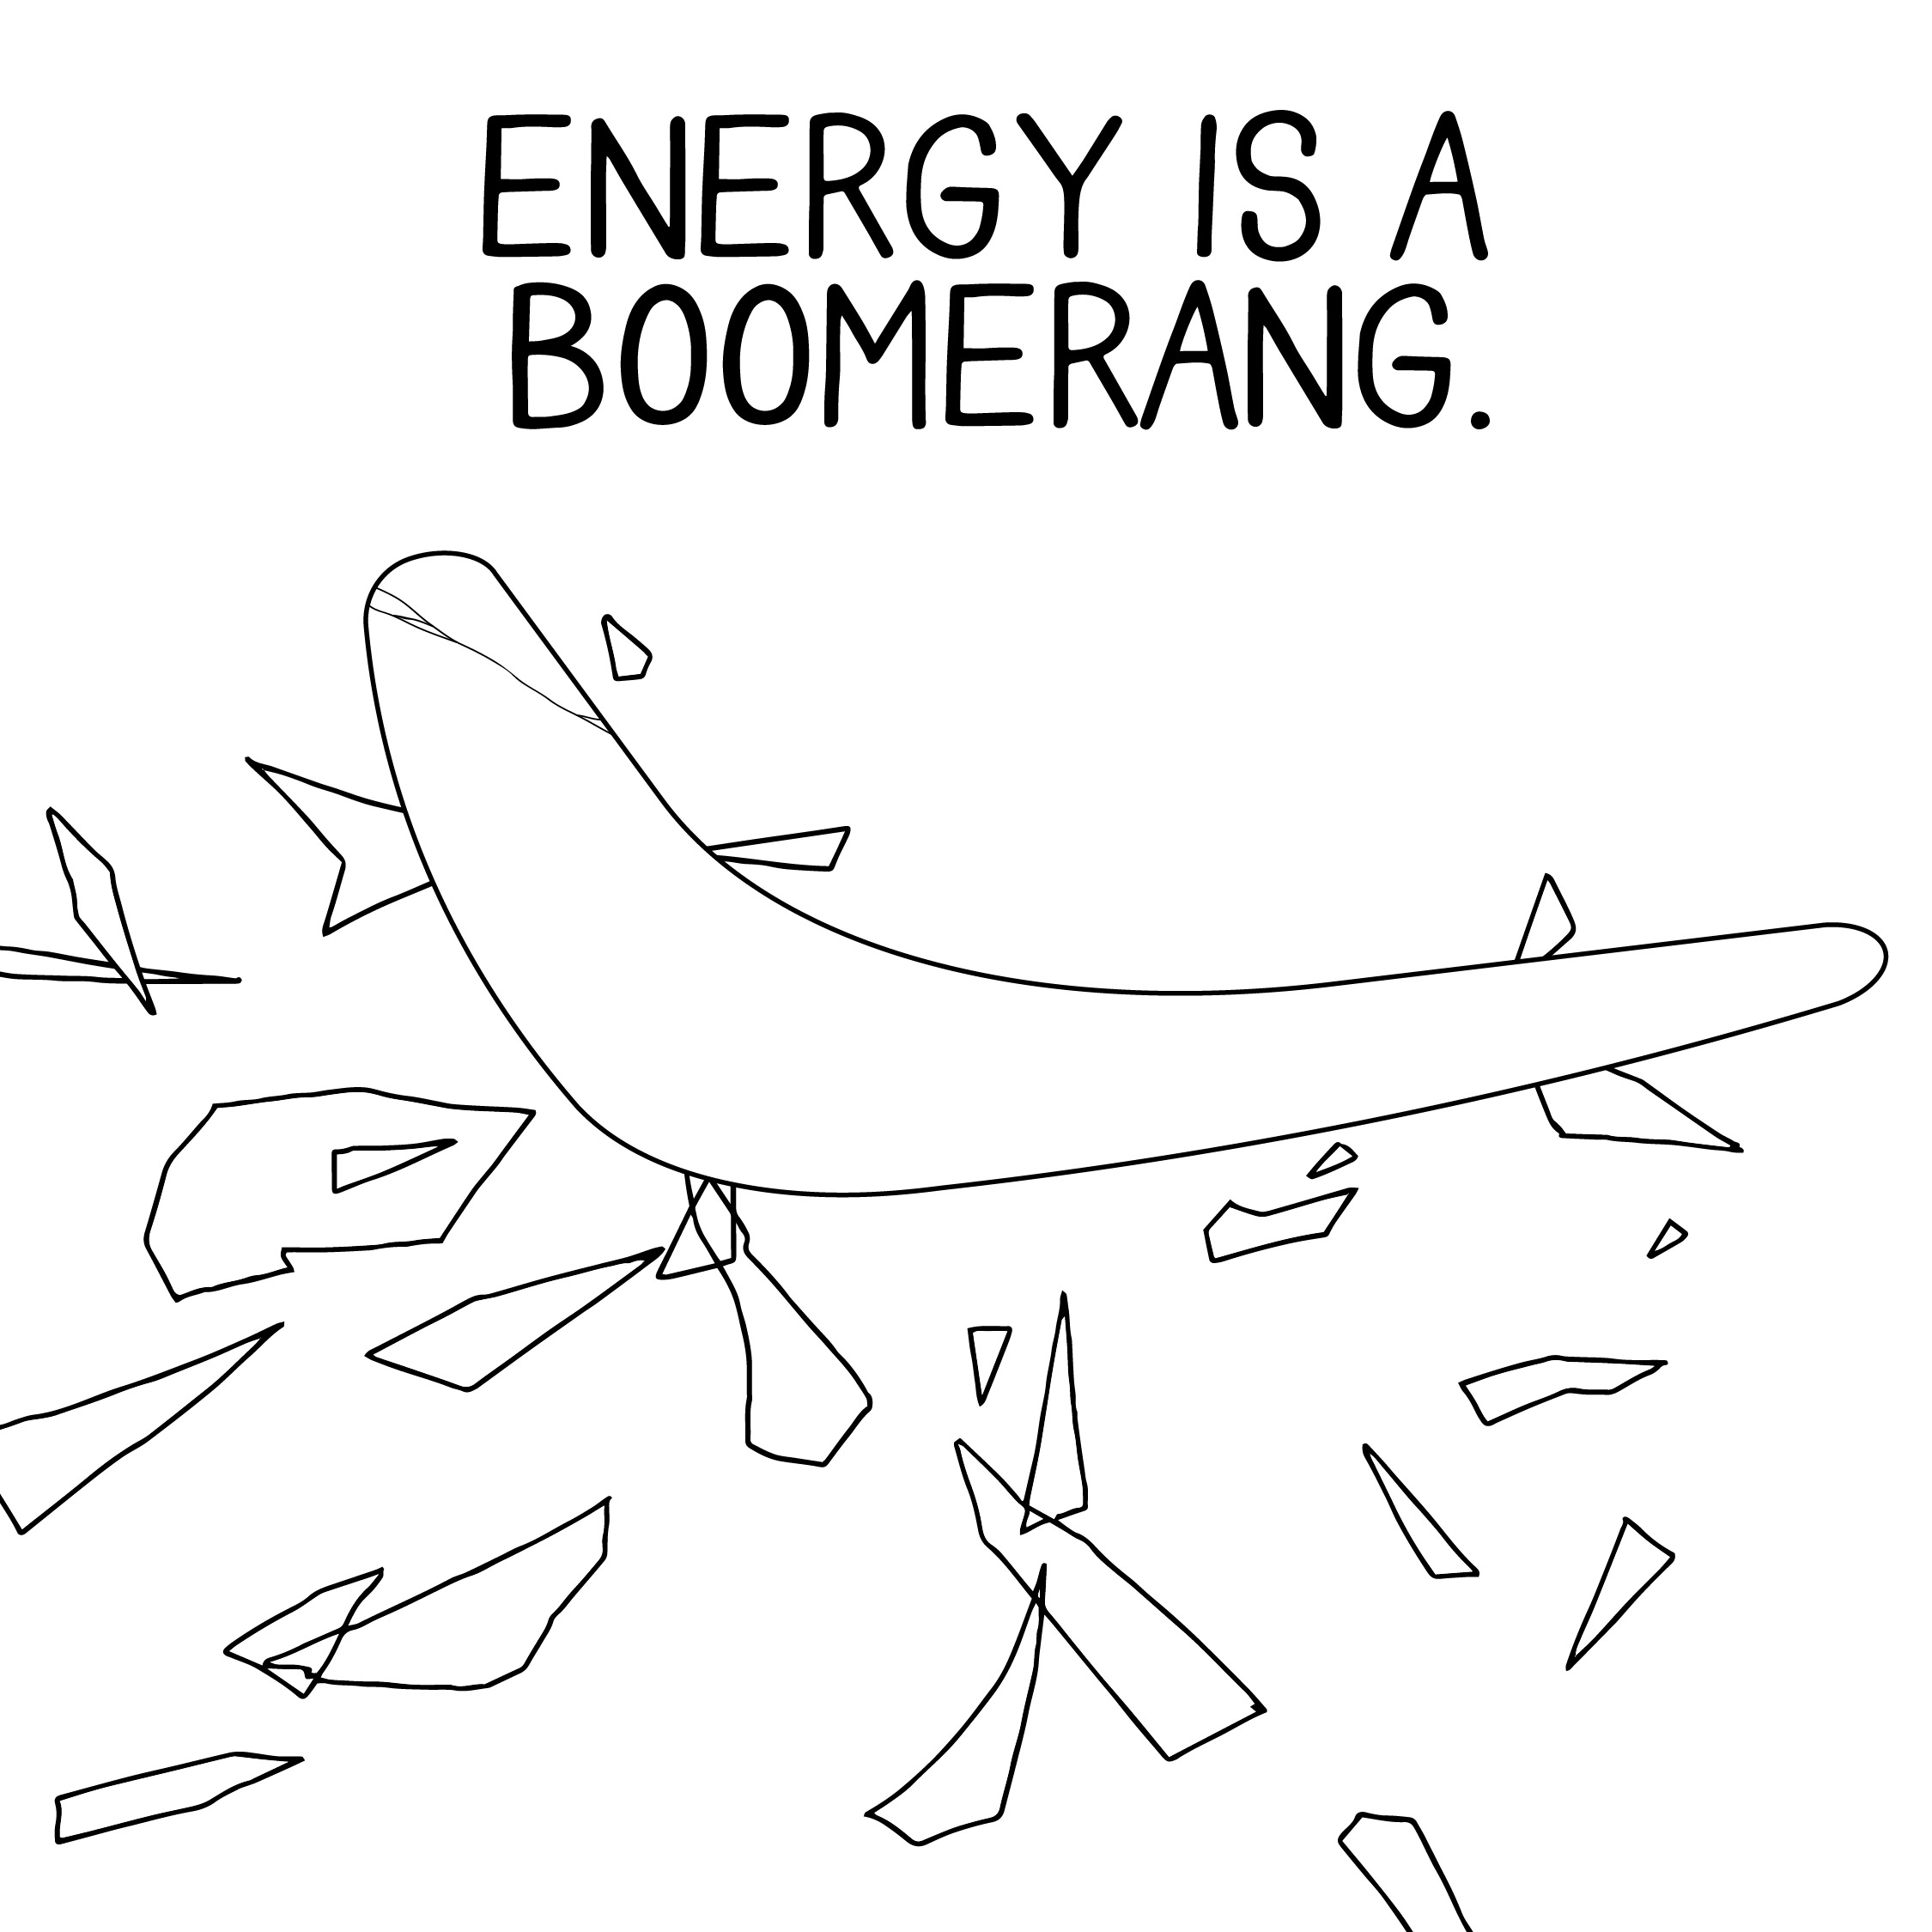 boomerang-01.jpg